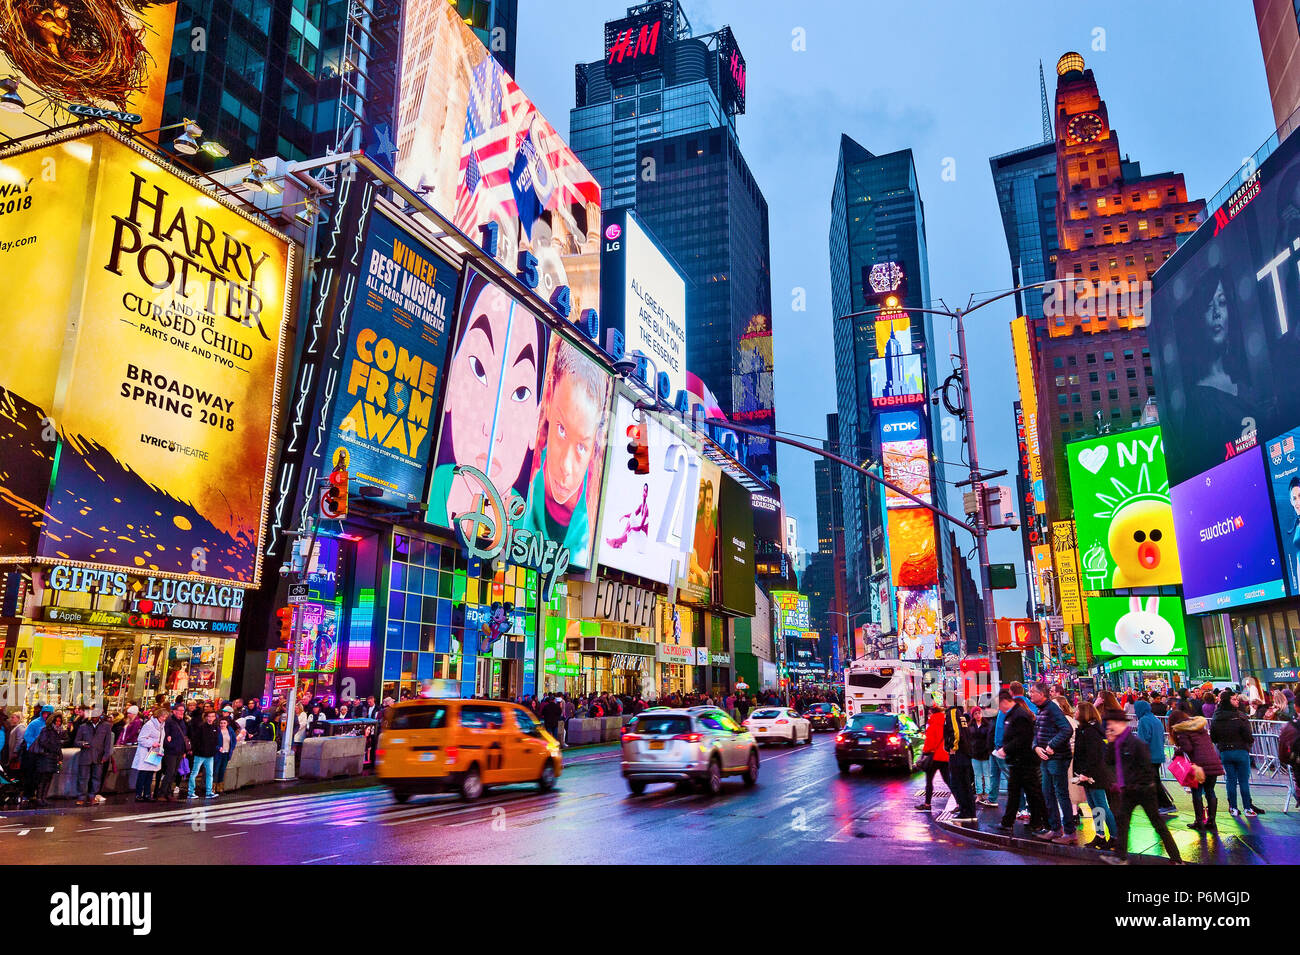 Luces de Nueva York Times Square de Manhattan, Nueva York Imagen De Stock